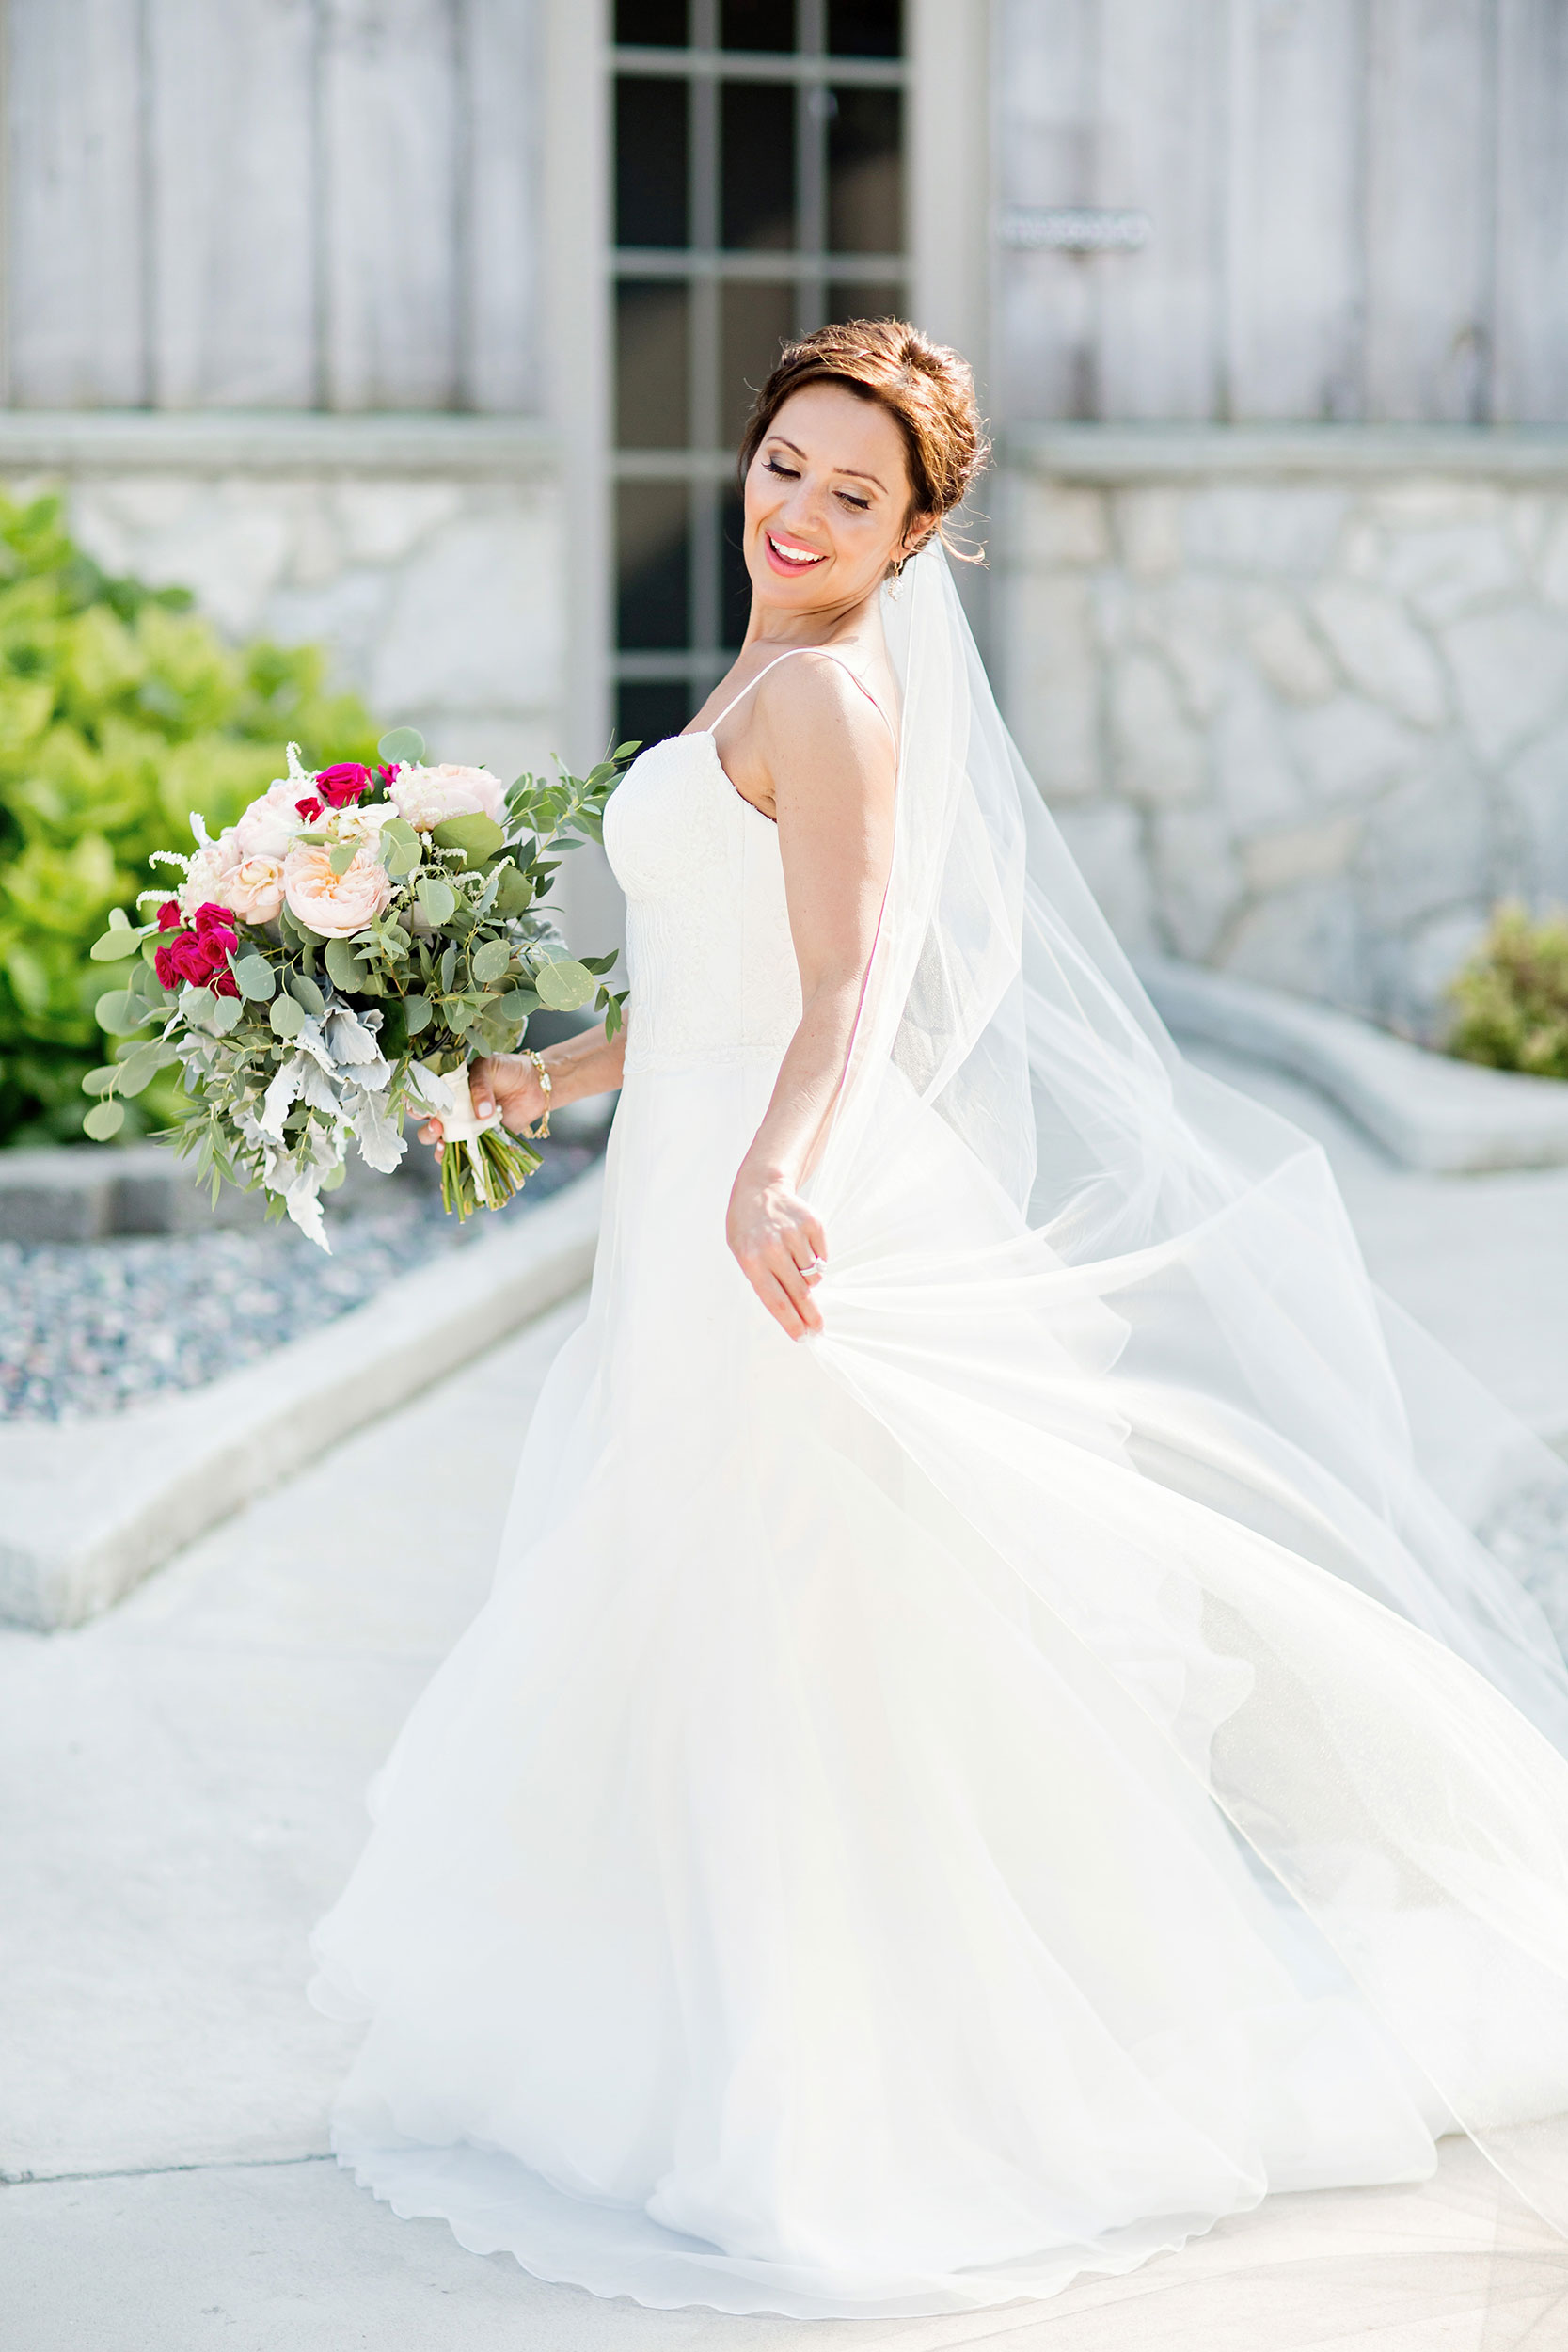 stylish-wedding-photography-windsor-toronto-ontario-wedding-photographer-sprucewood-winery-eryn-shea-photography-37.JPG